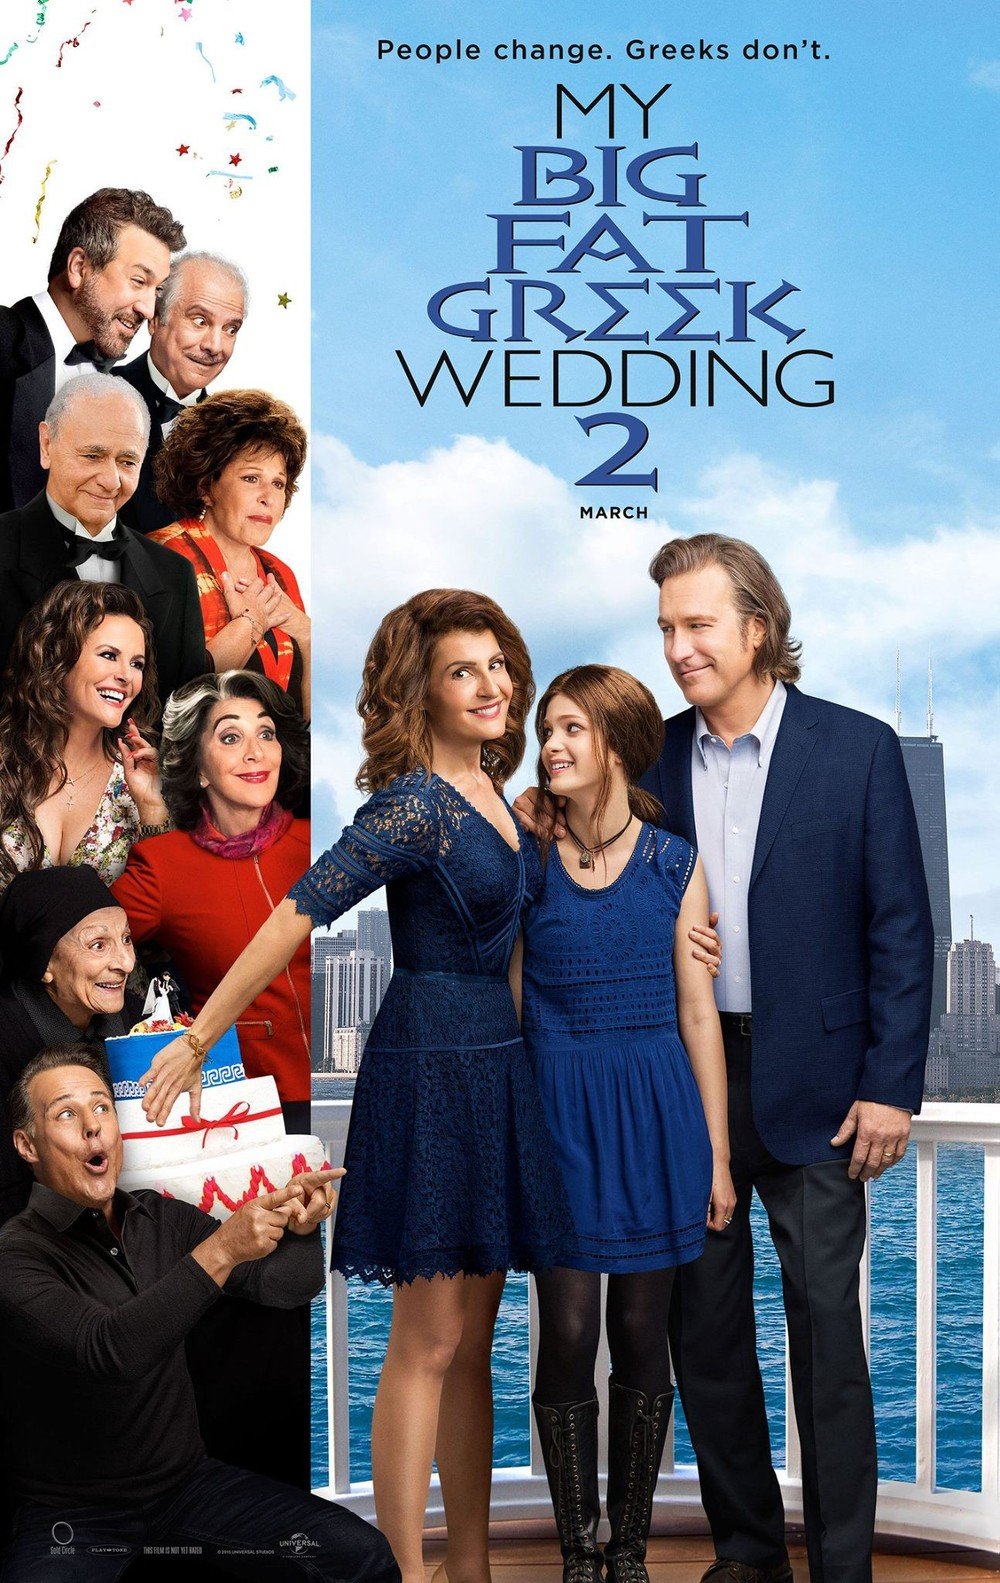 My Big Fat Greek Wedding 2 DVD Release Date Redbox Netflix ITunes